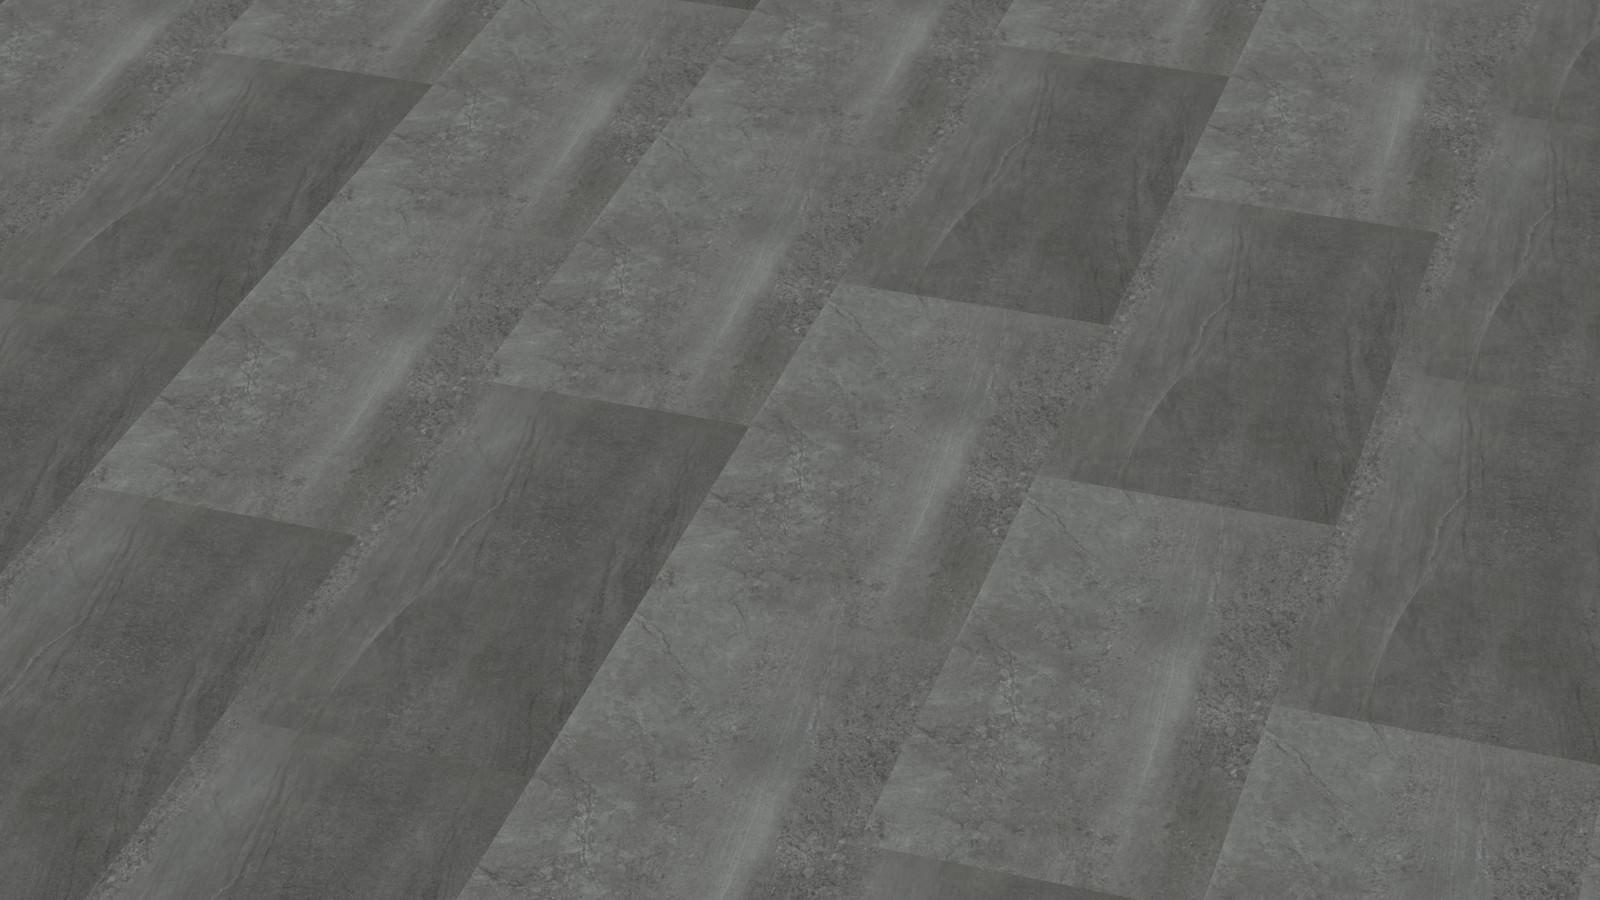 Therdex grote pvc visgraat vloer in amsterdam obly